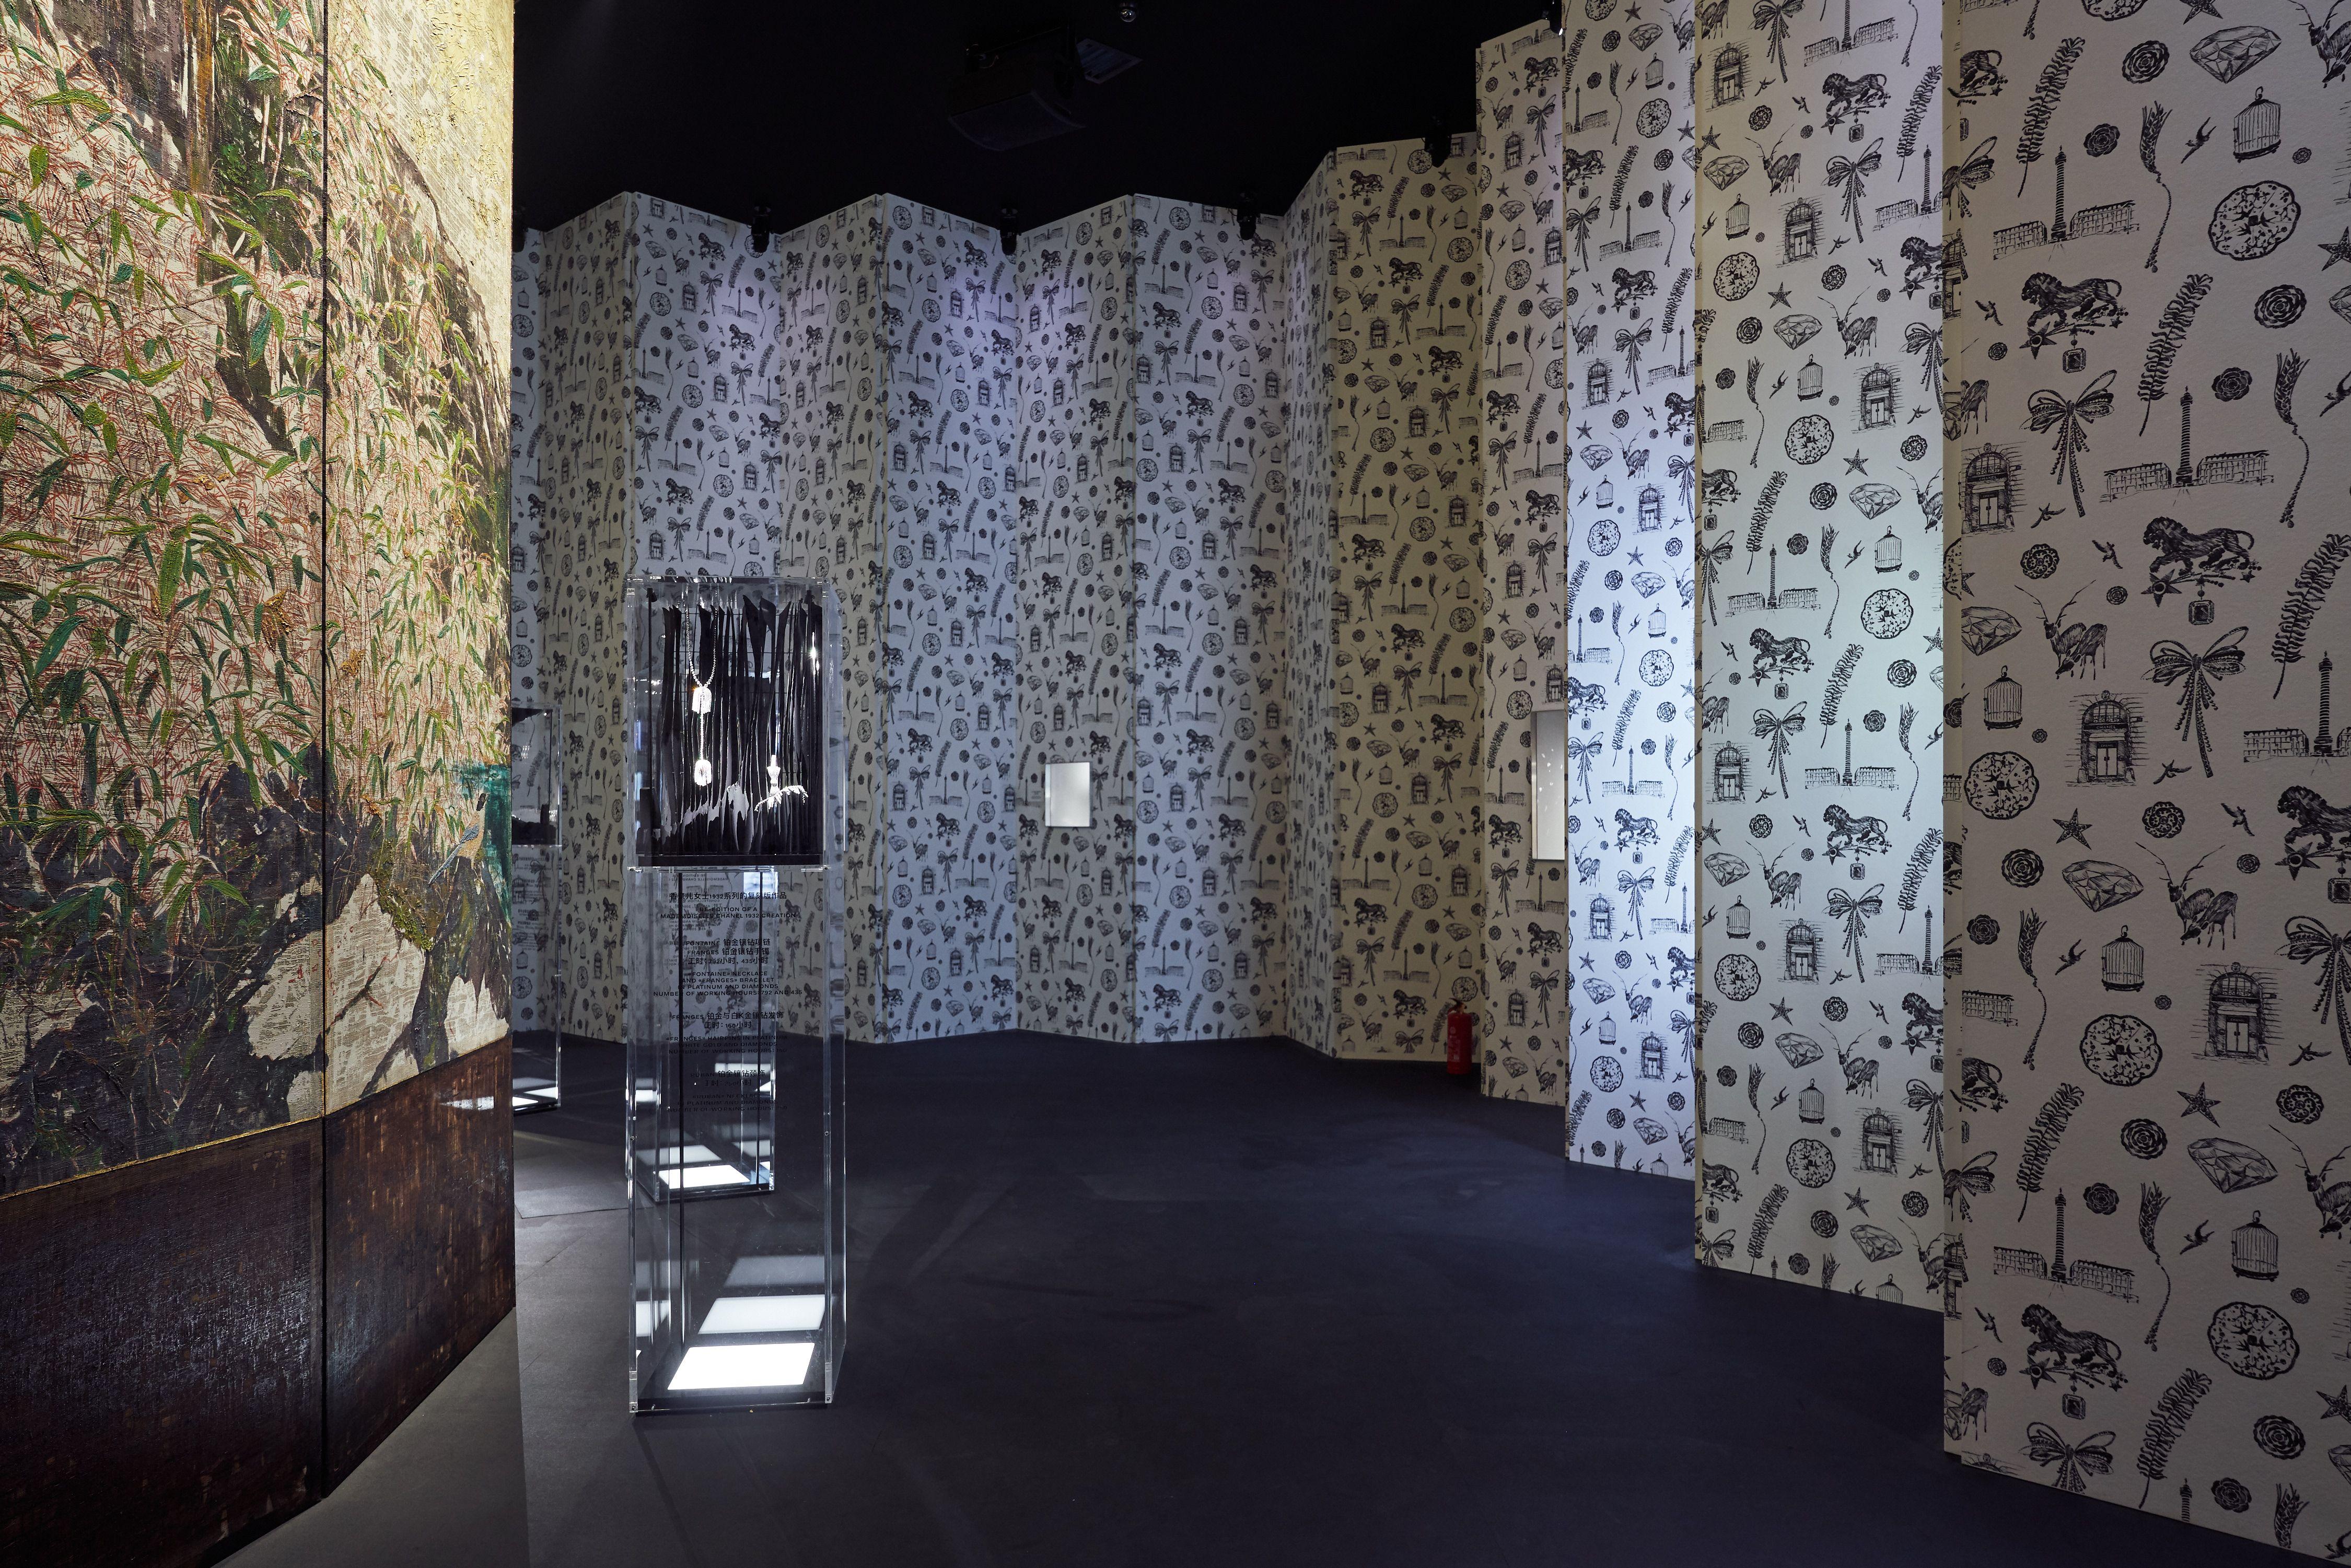 3beaaeb199c4 Inside Chanel s Mademoiselle Privé Exhibit